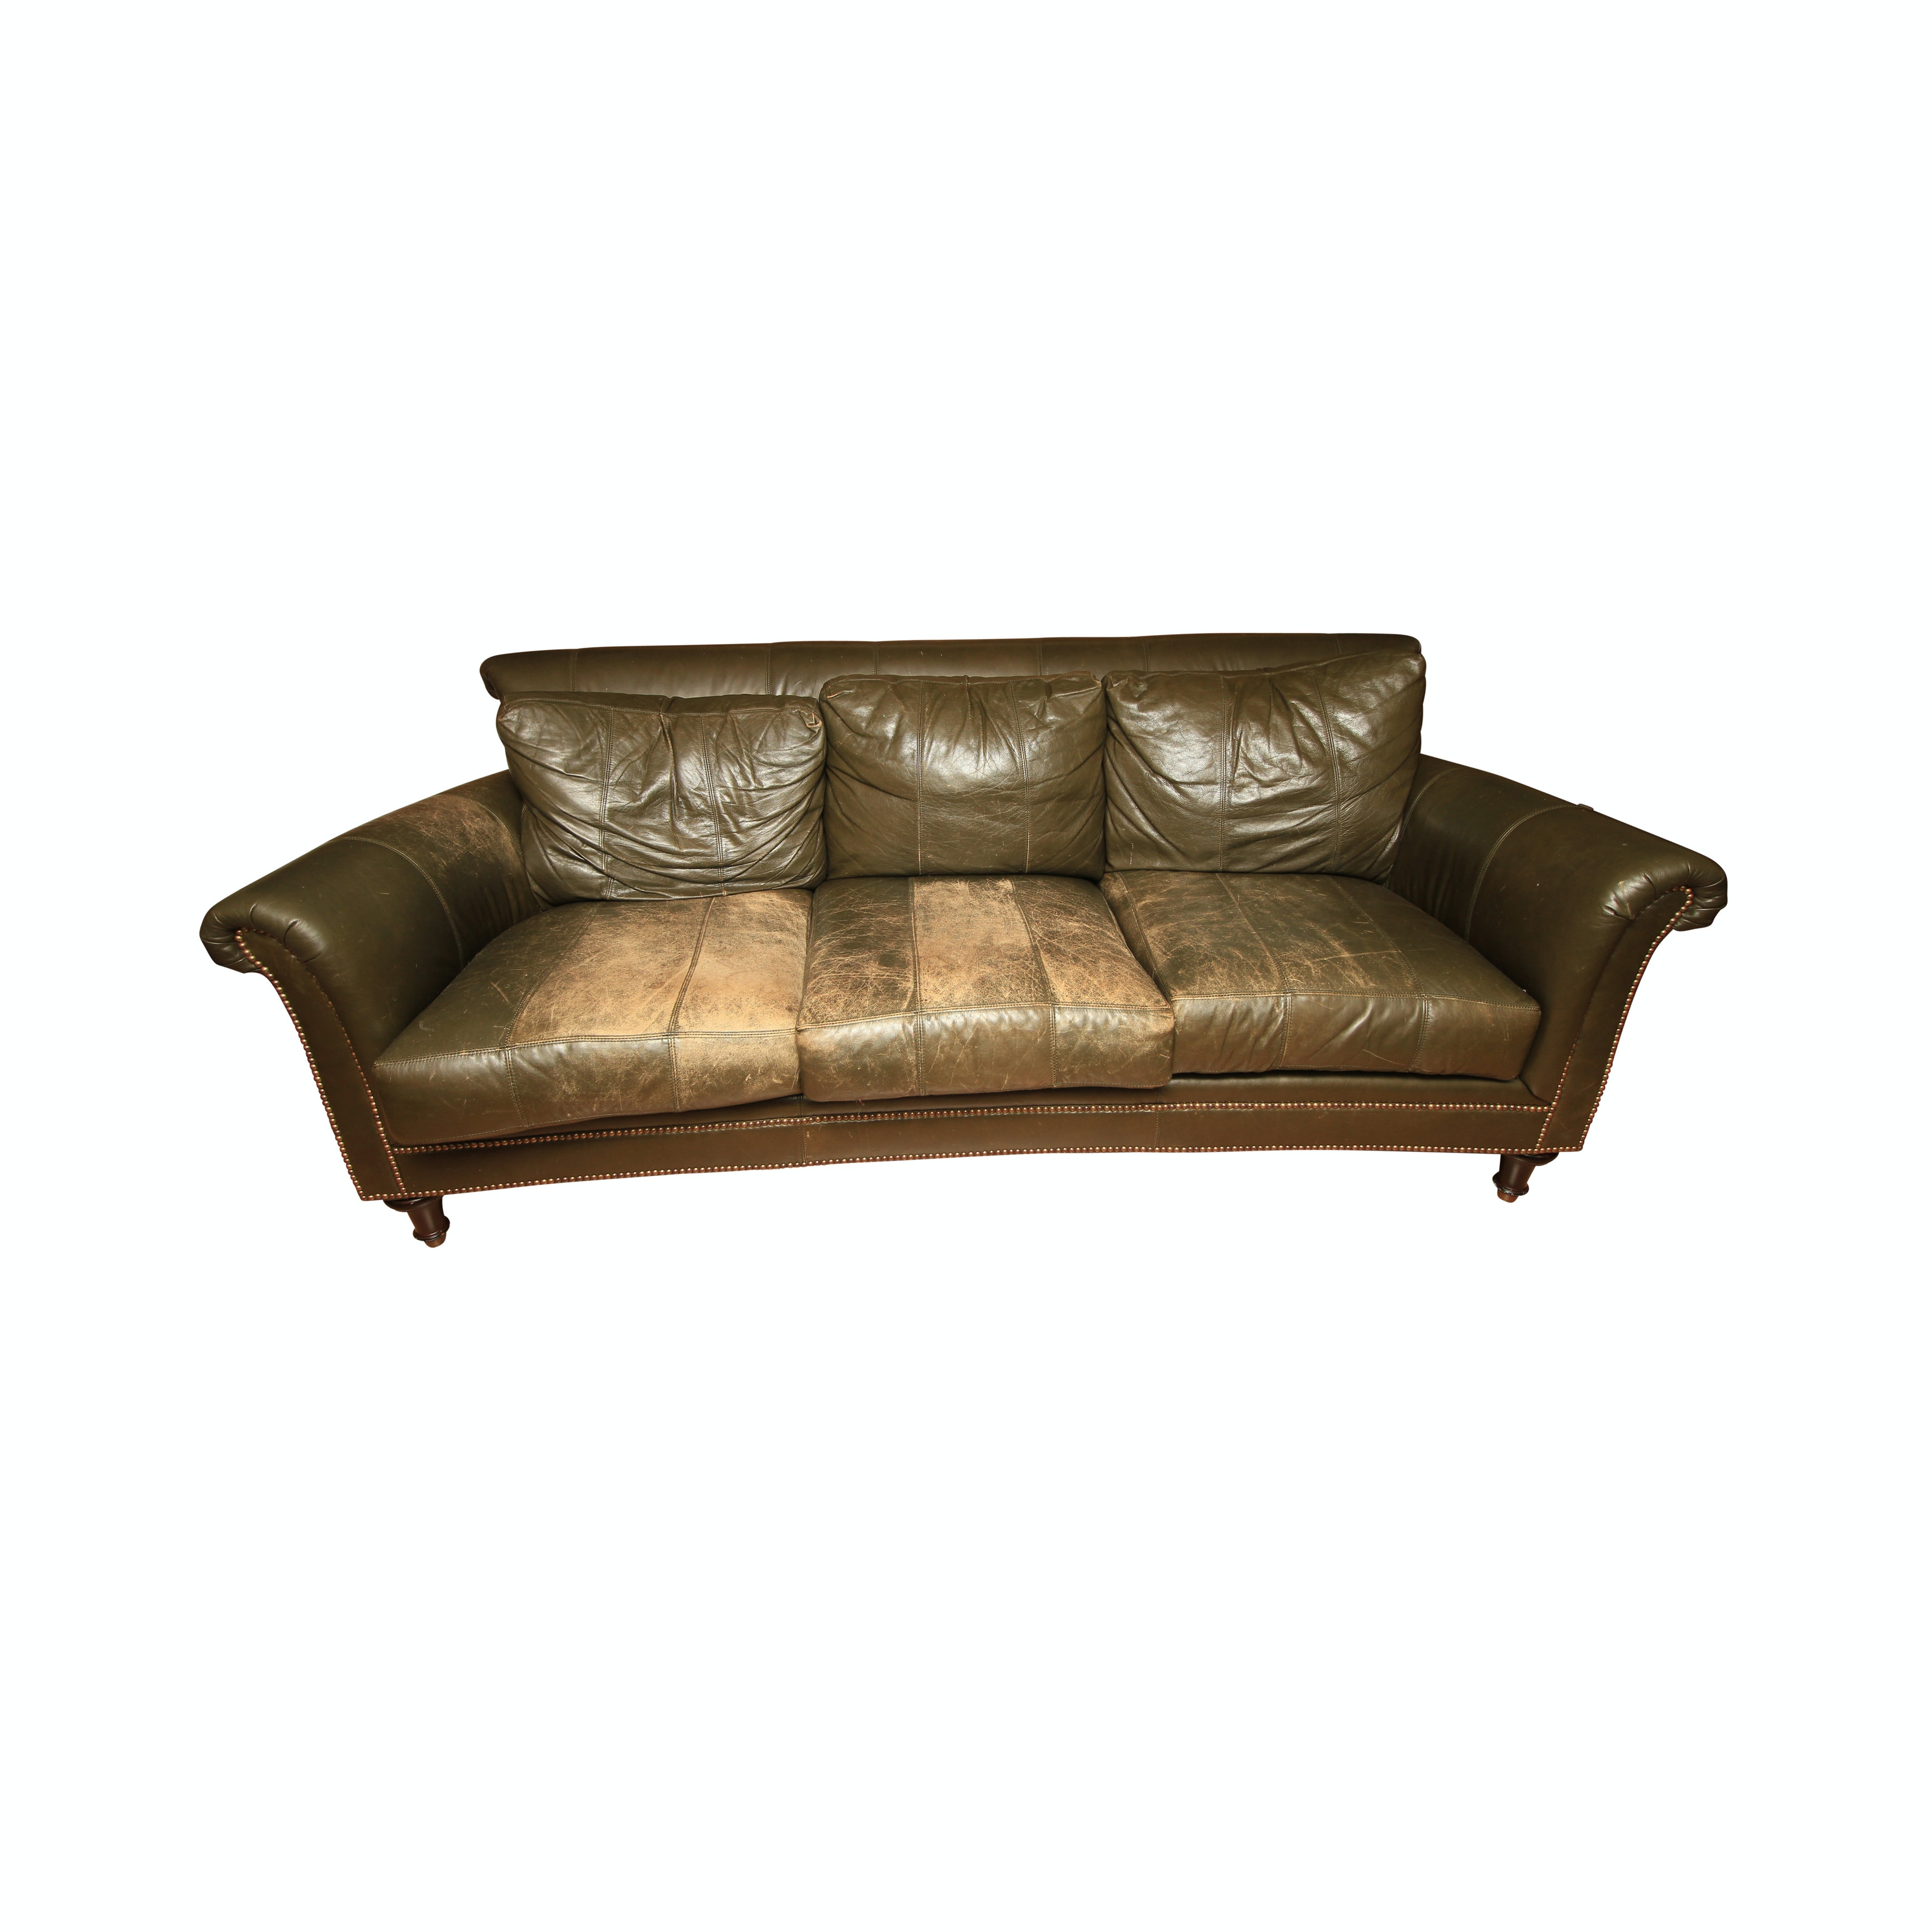 Vintage Leather Sofa By Ferguson Copeland Ltd. ...